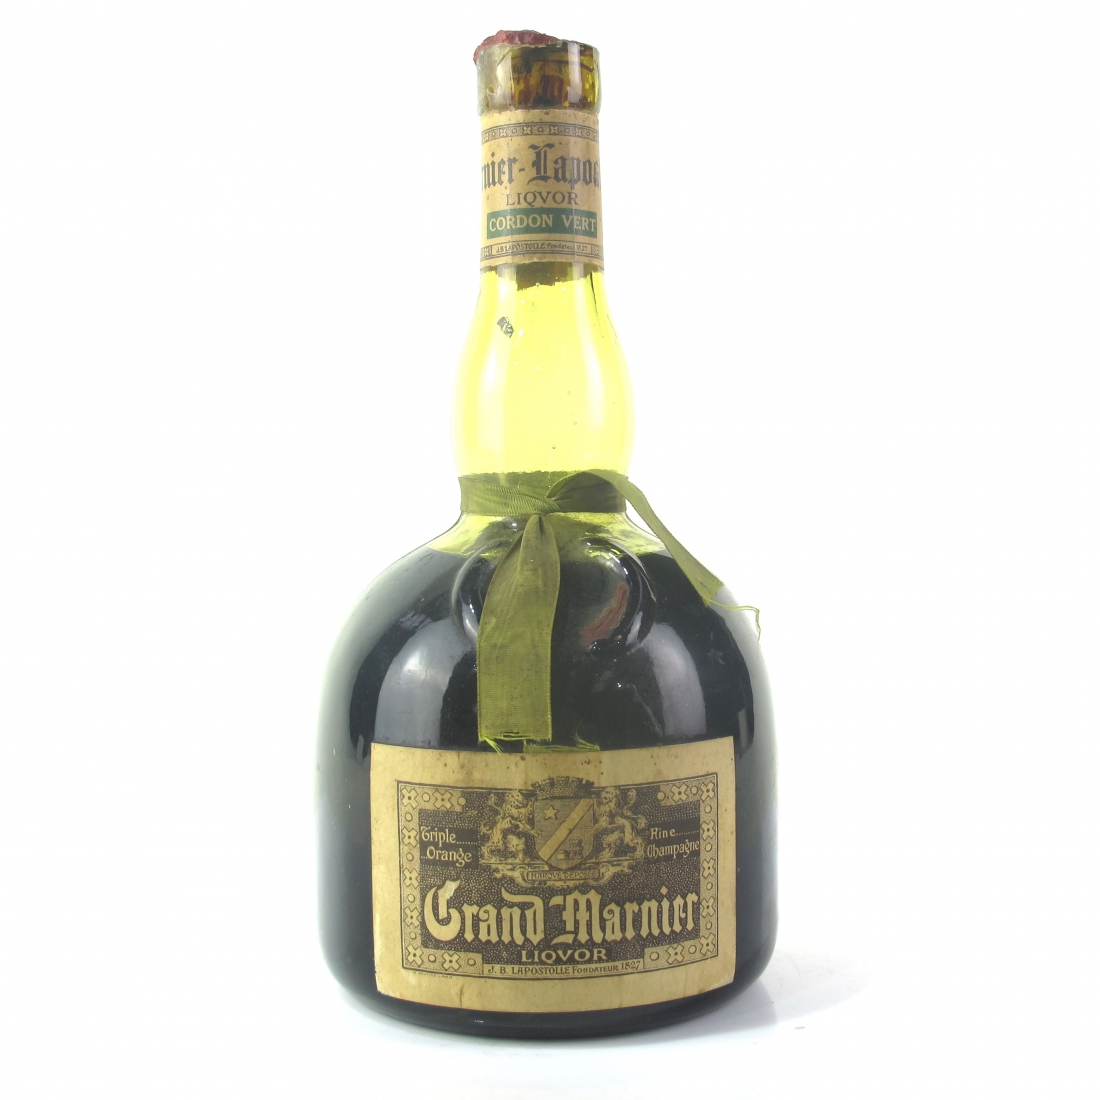 Grand Marnier Cordon Vert 1930/40s